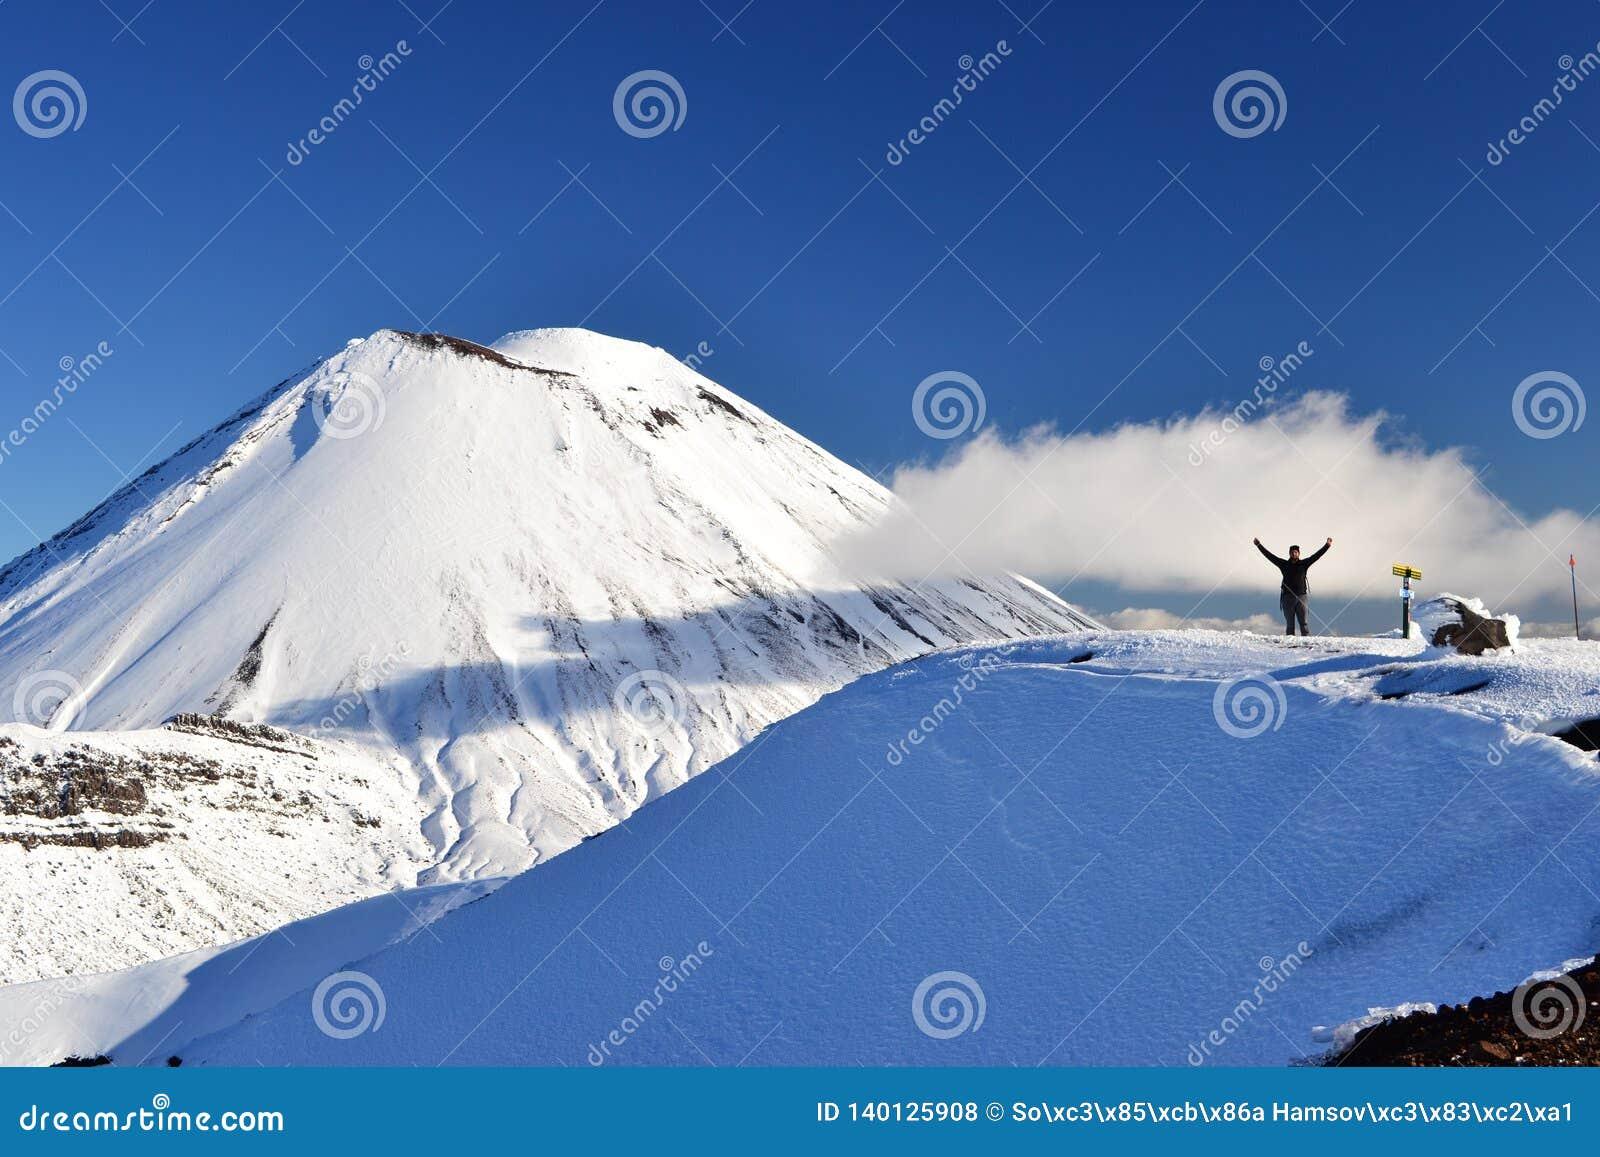 Berg-Schicksal im Schnee, Winterlandschaft in Nationalpark Tongariro